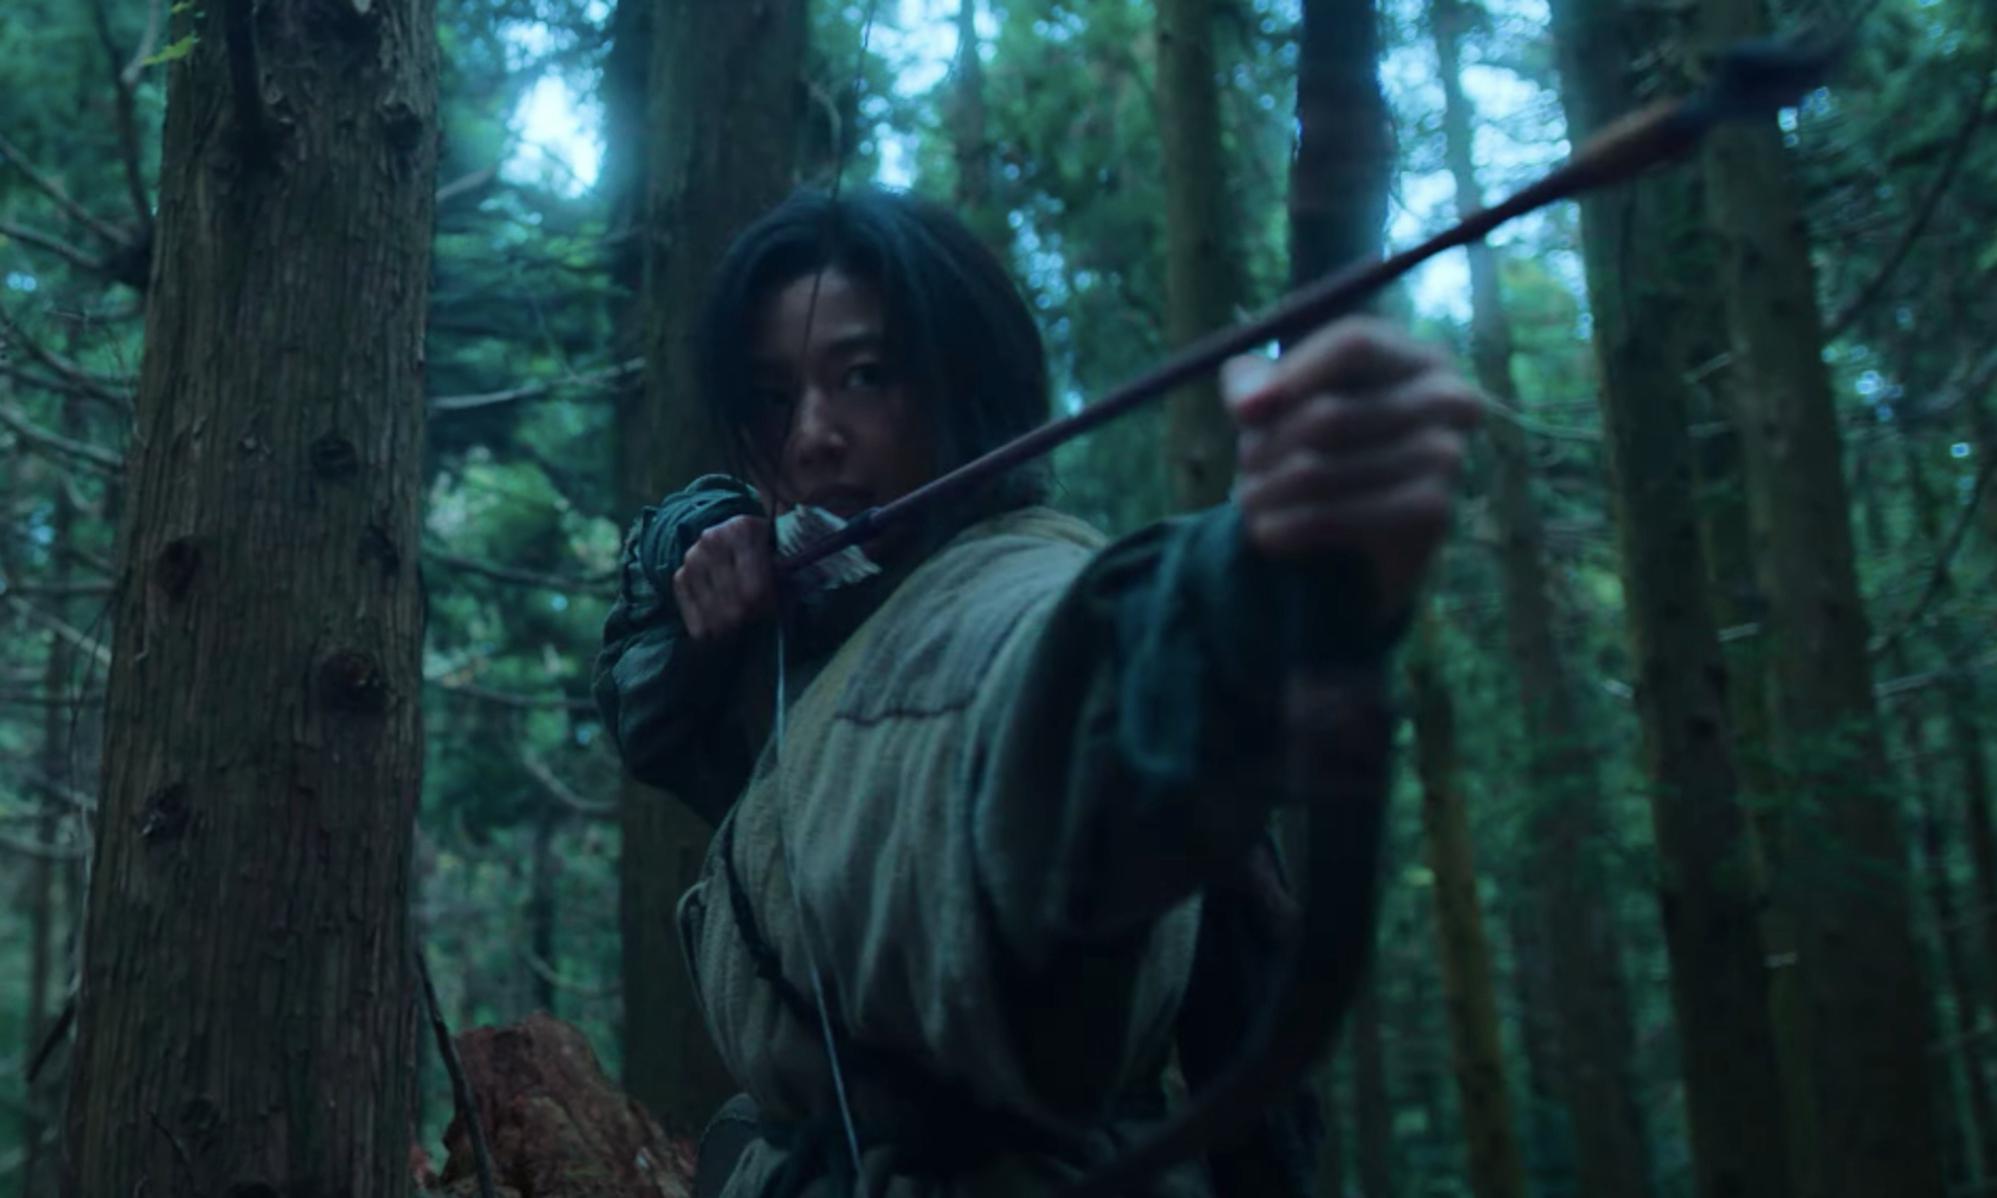 Netflix 人气剧集《李尸朝鲜:阿信传》发布全新预告片